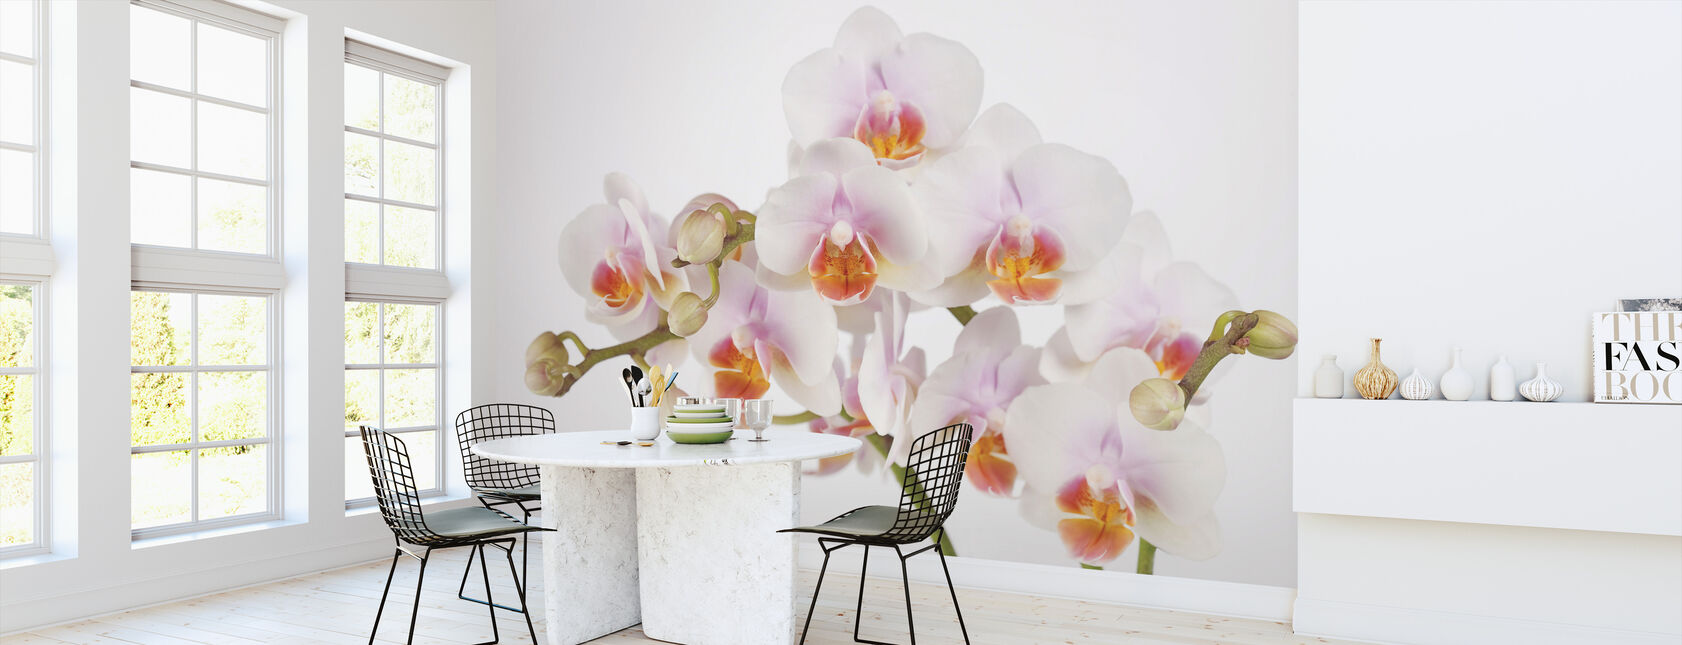 Soft Orchidee - Tapet - Kök